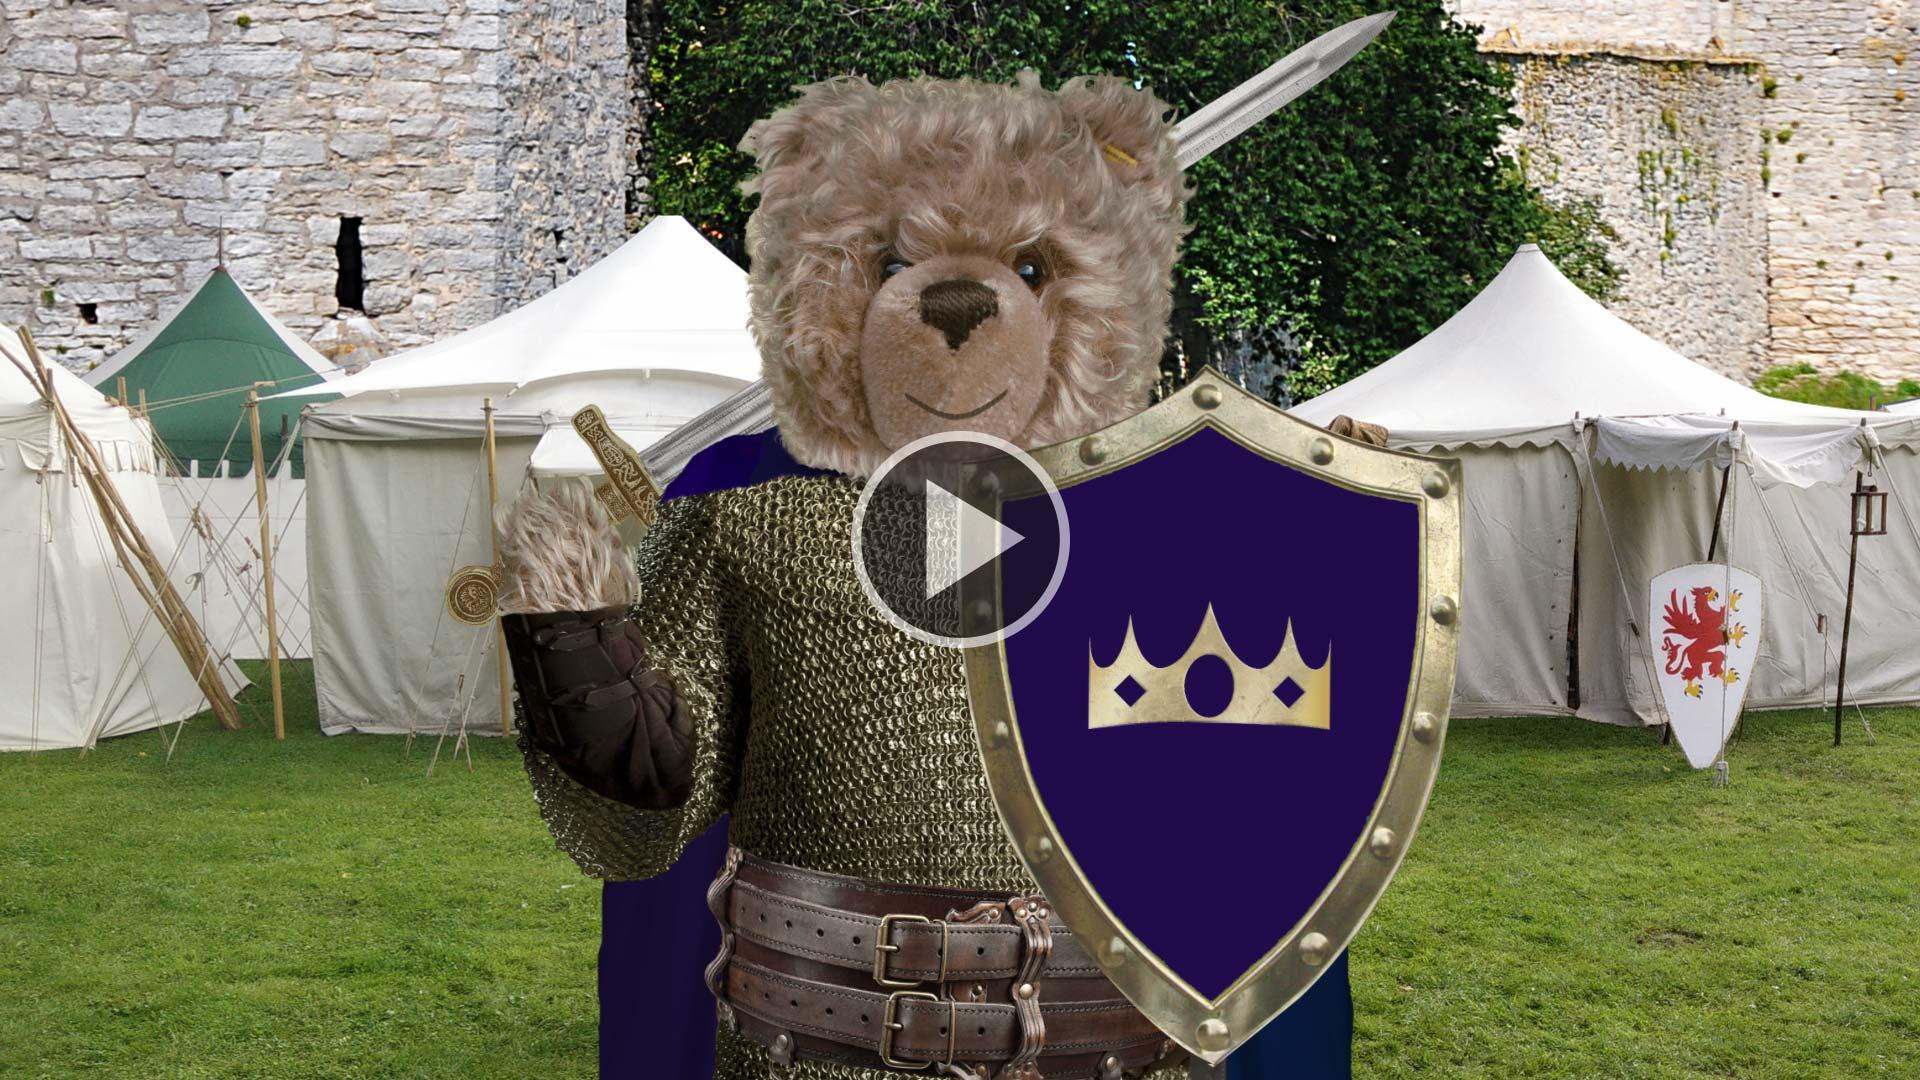 Teddybär-König Opa bei der Mittelalterwoche in Visby